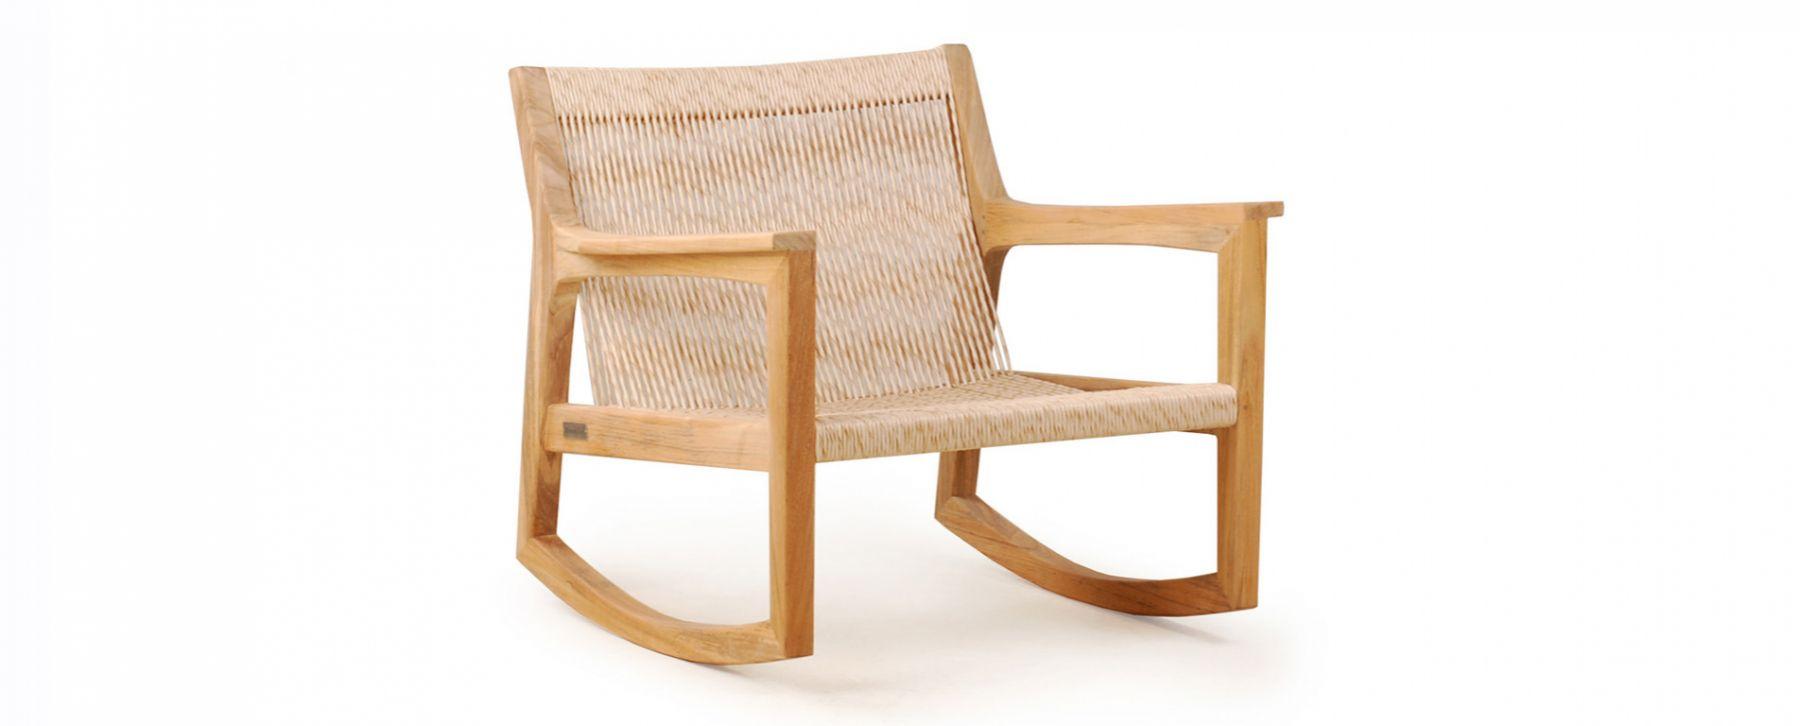 Modern Rattan Weaving Teak Rocking Chair Rope Pool